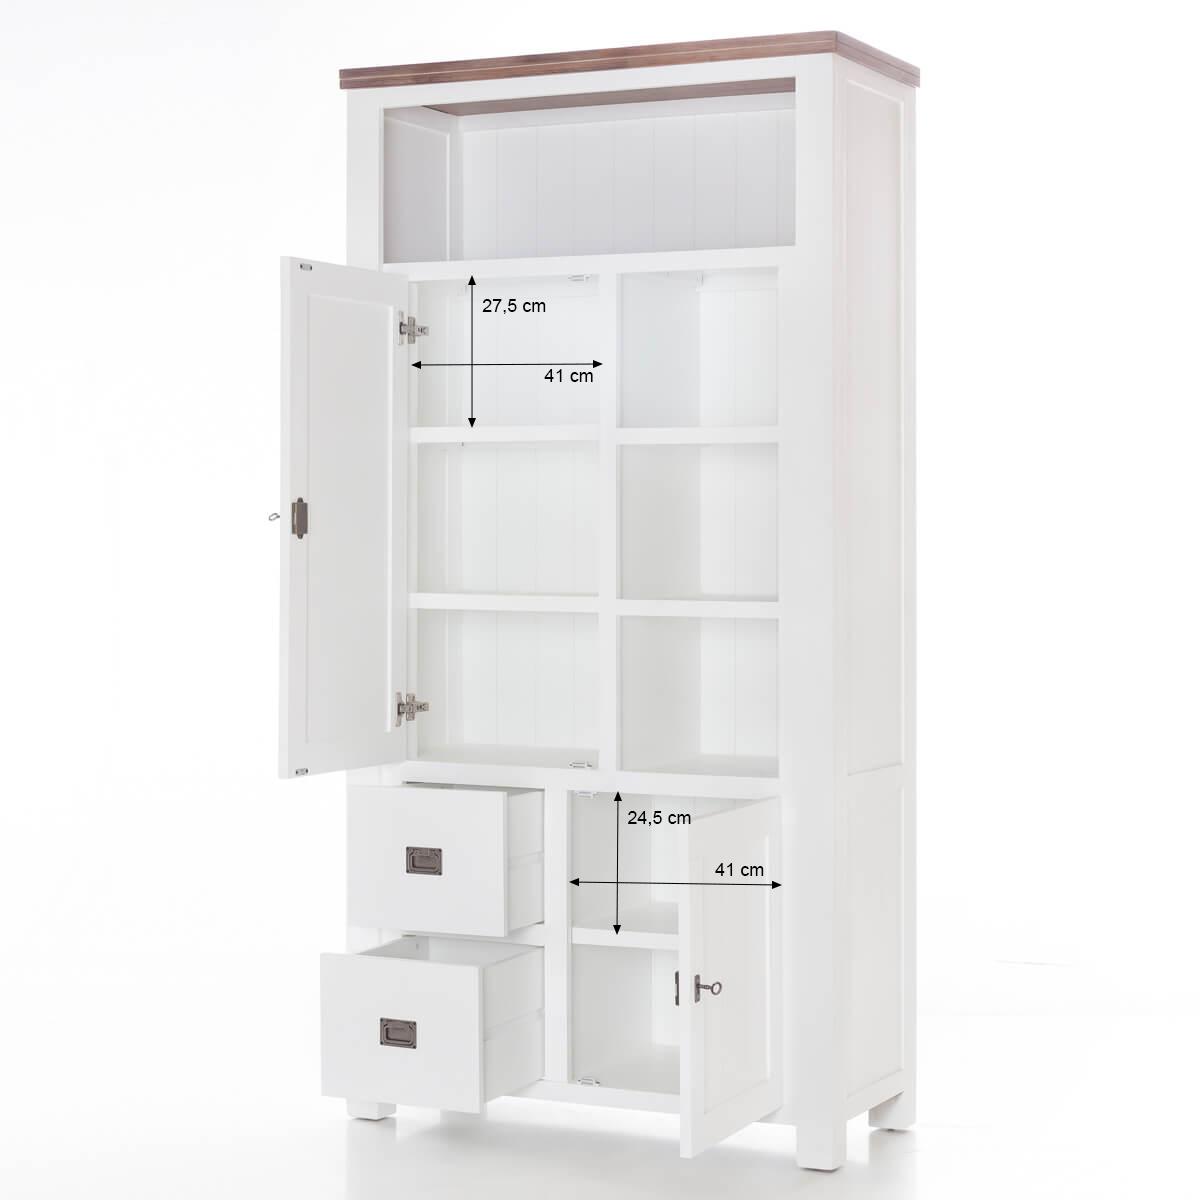 highboard weiss braun landhaus massiv 100 x 200 cm kommode. Black Bedroom Furniture Sets. Home Design Ideas